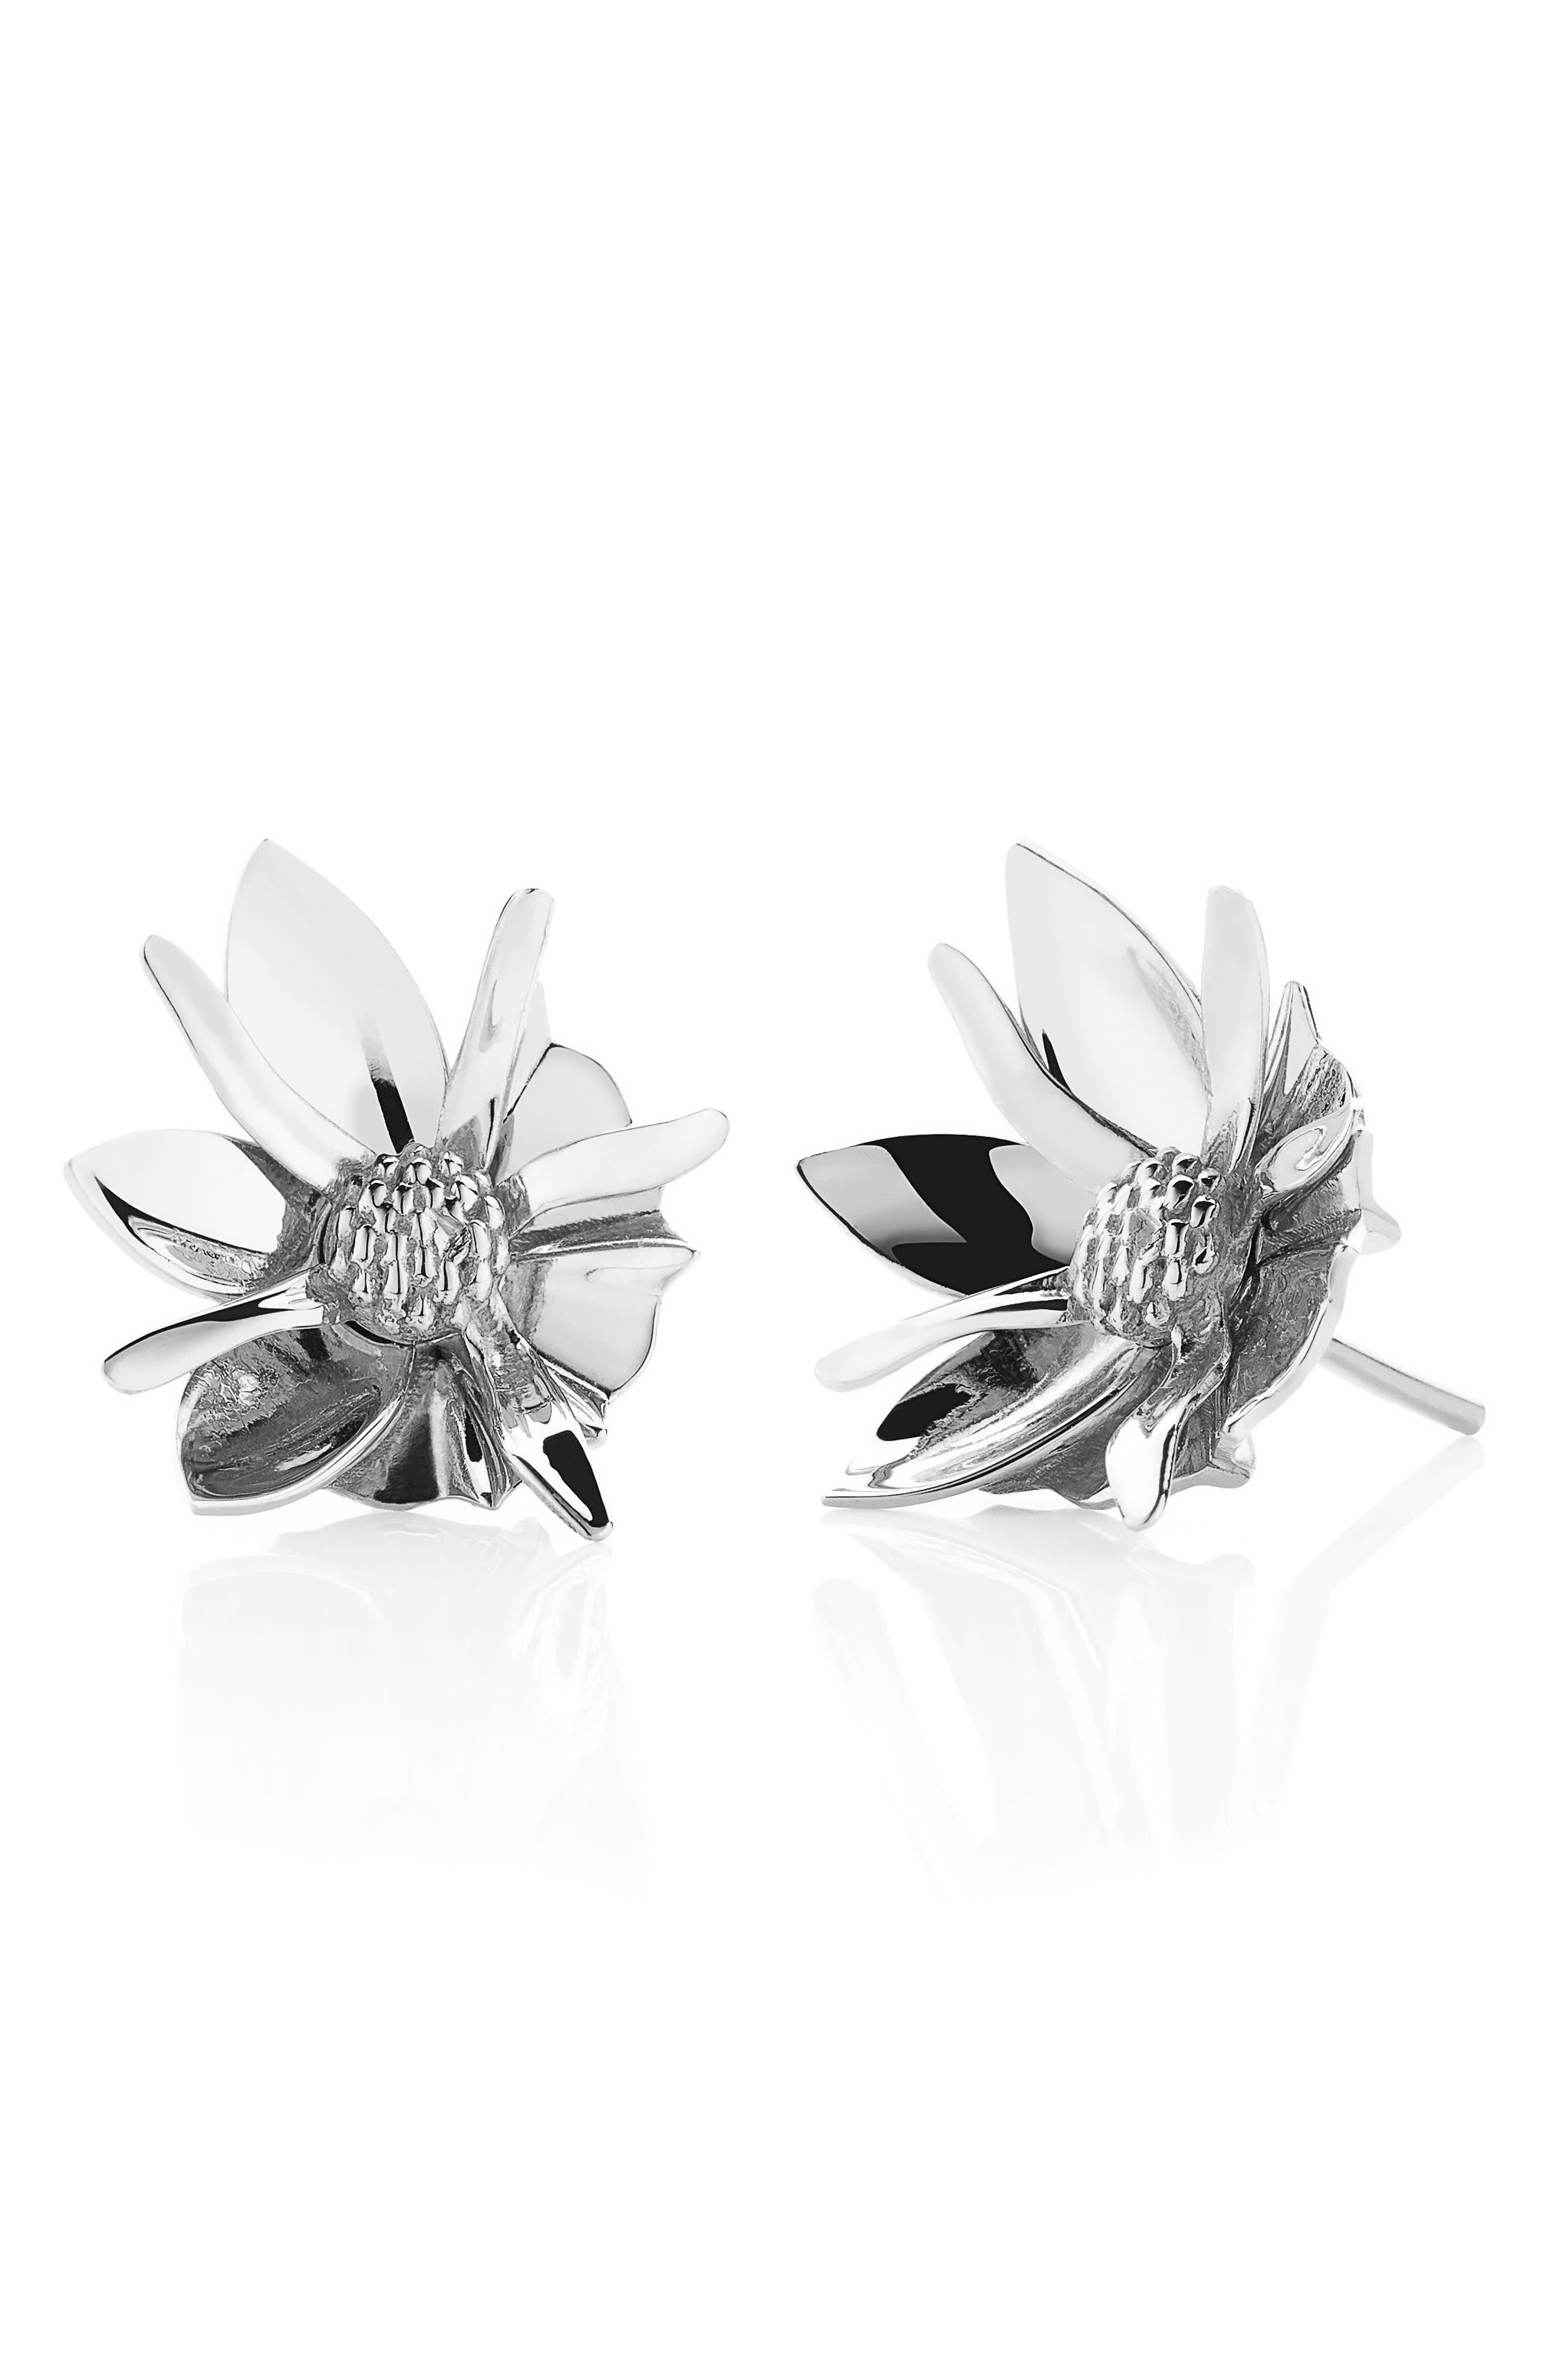 MEADOWLARK Small Wildflower Stud Earrings